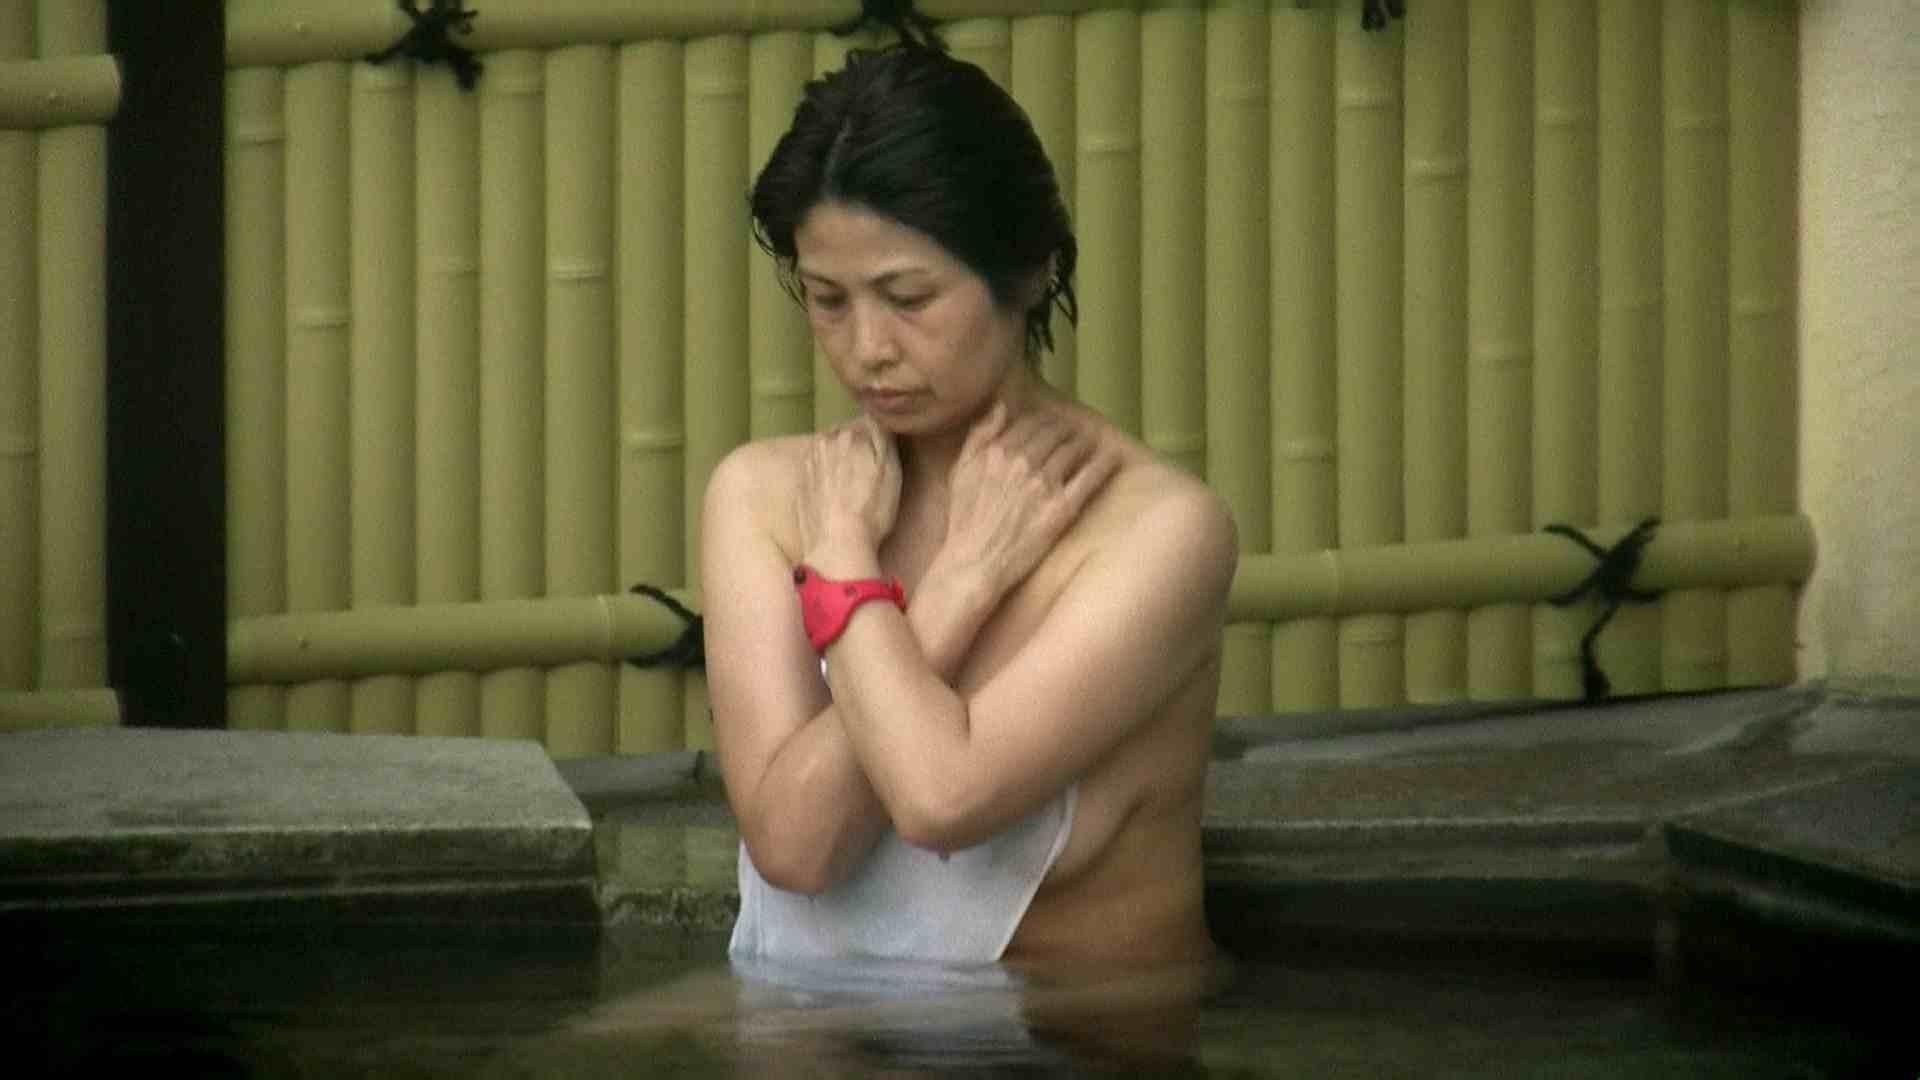 Aquaな露天風呂Vol.636 OL女体  87連発 39